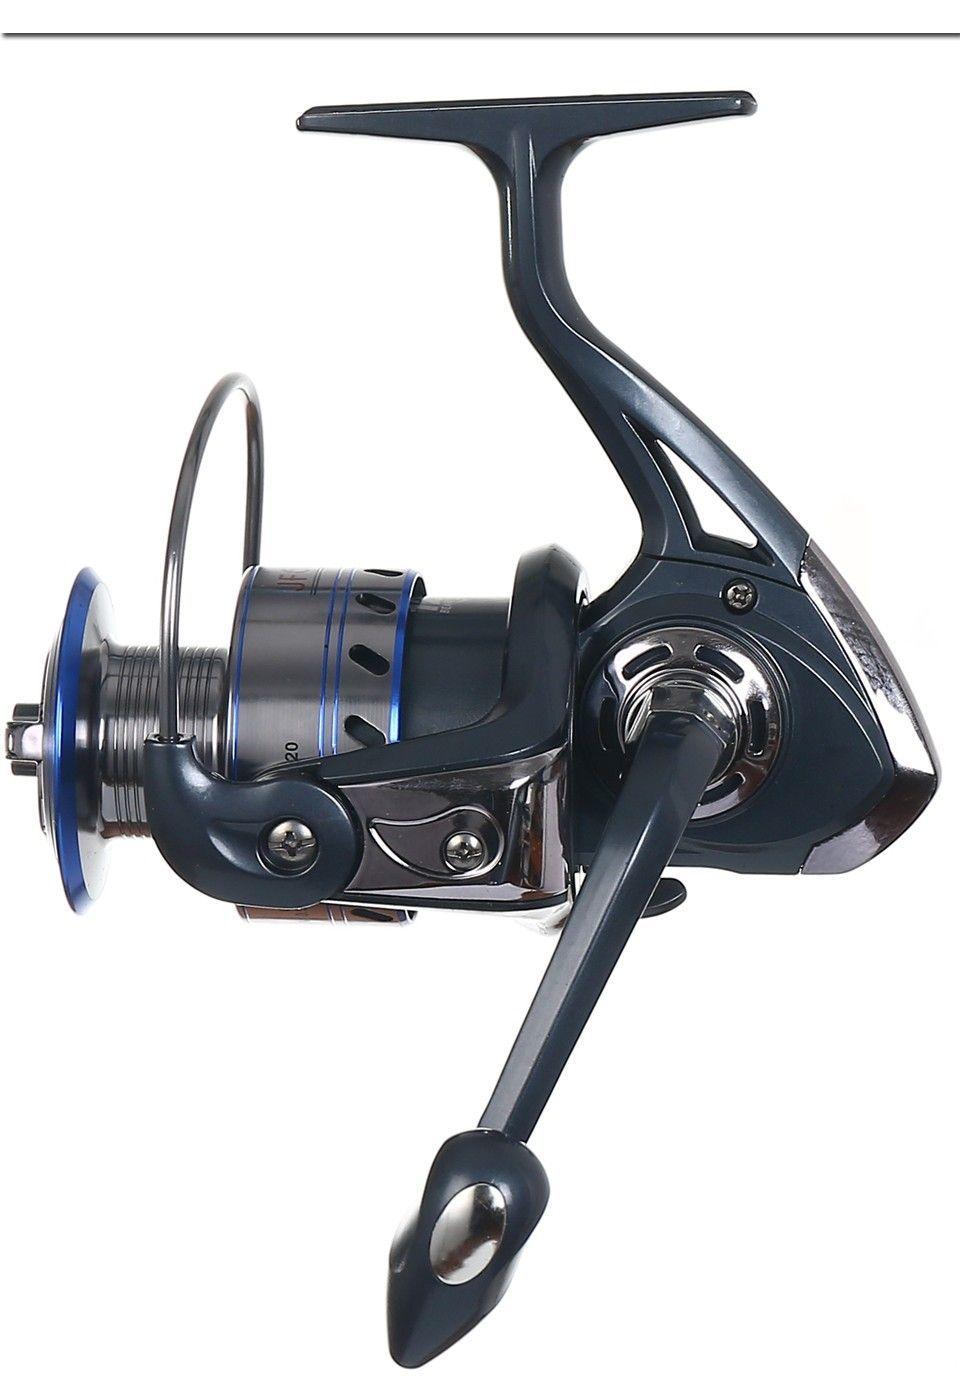 Hot Super Allblue Technology Fishing Reel 12bb 1 Bearing Balls 1000 7000 Series Abjf Spinning Reel Boat Fishing Reels Fishing Accessories Best Fishing Reels